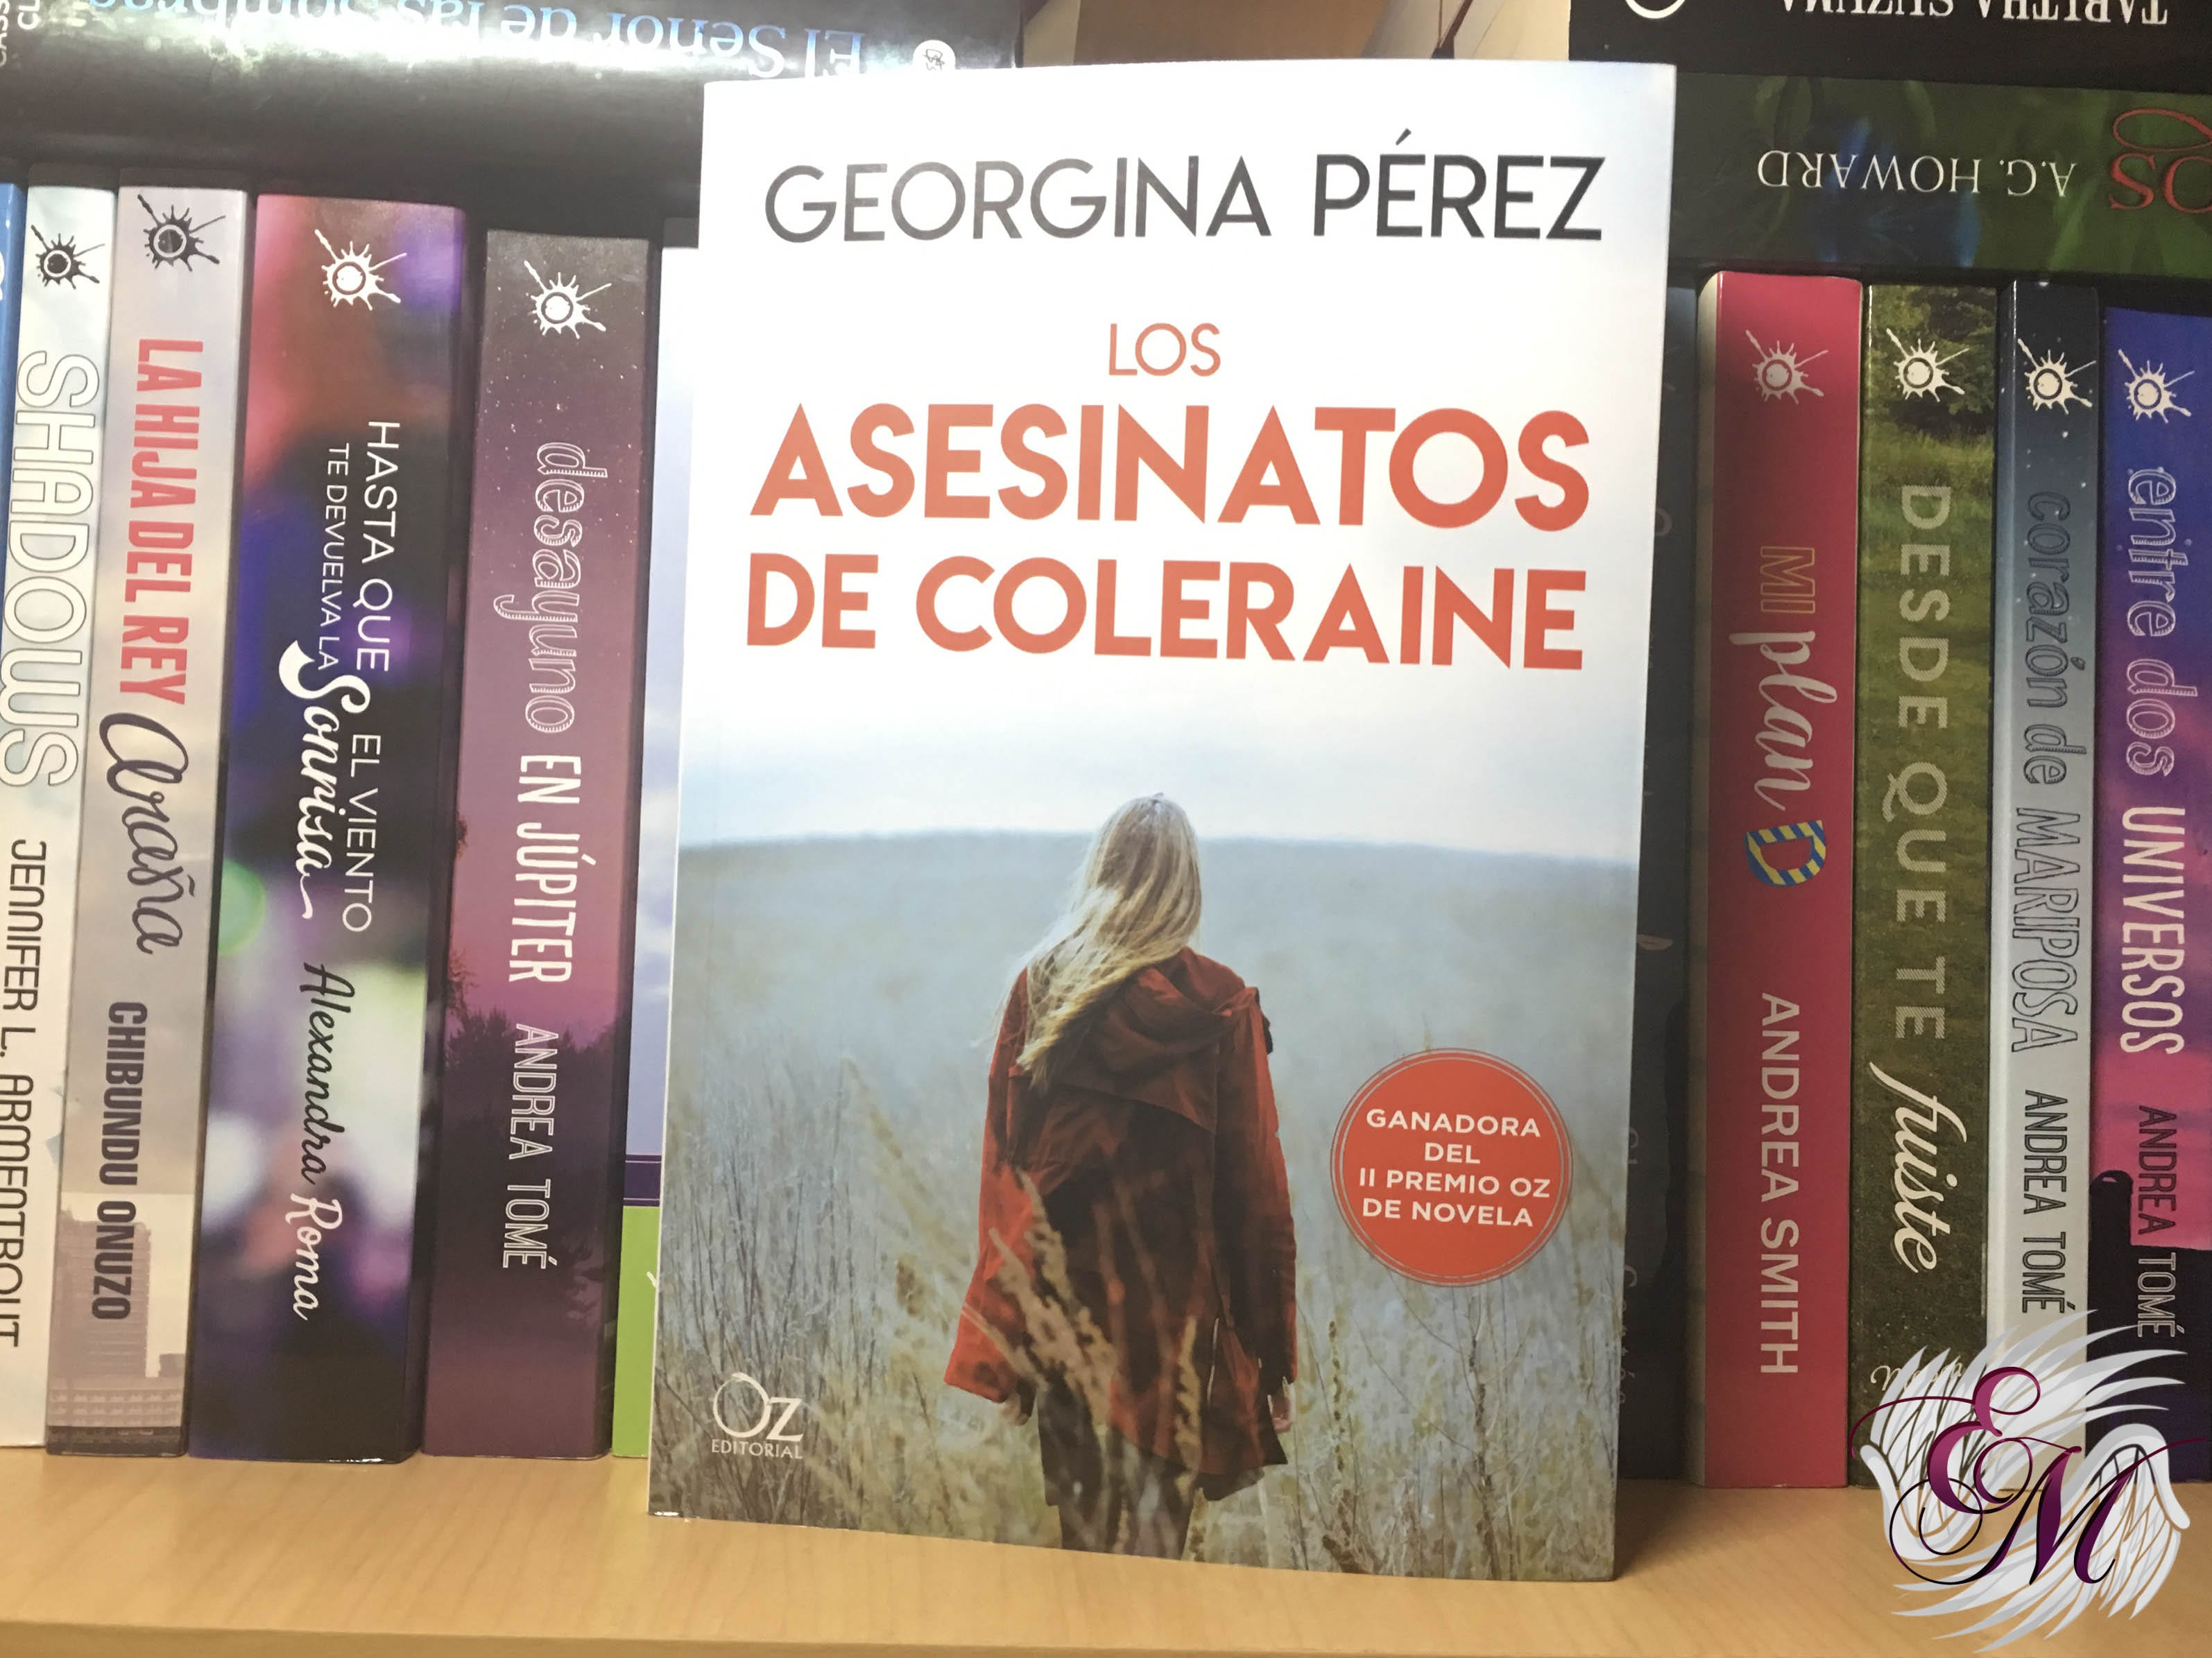 Los asesinatos de Coleraine, de Georgina Pérez - Reseña